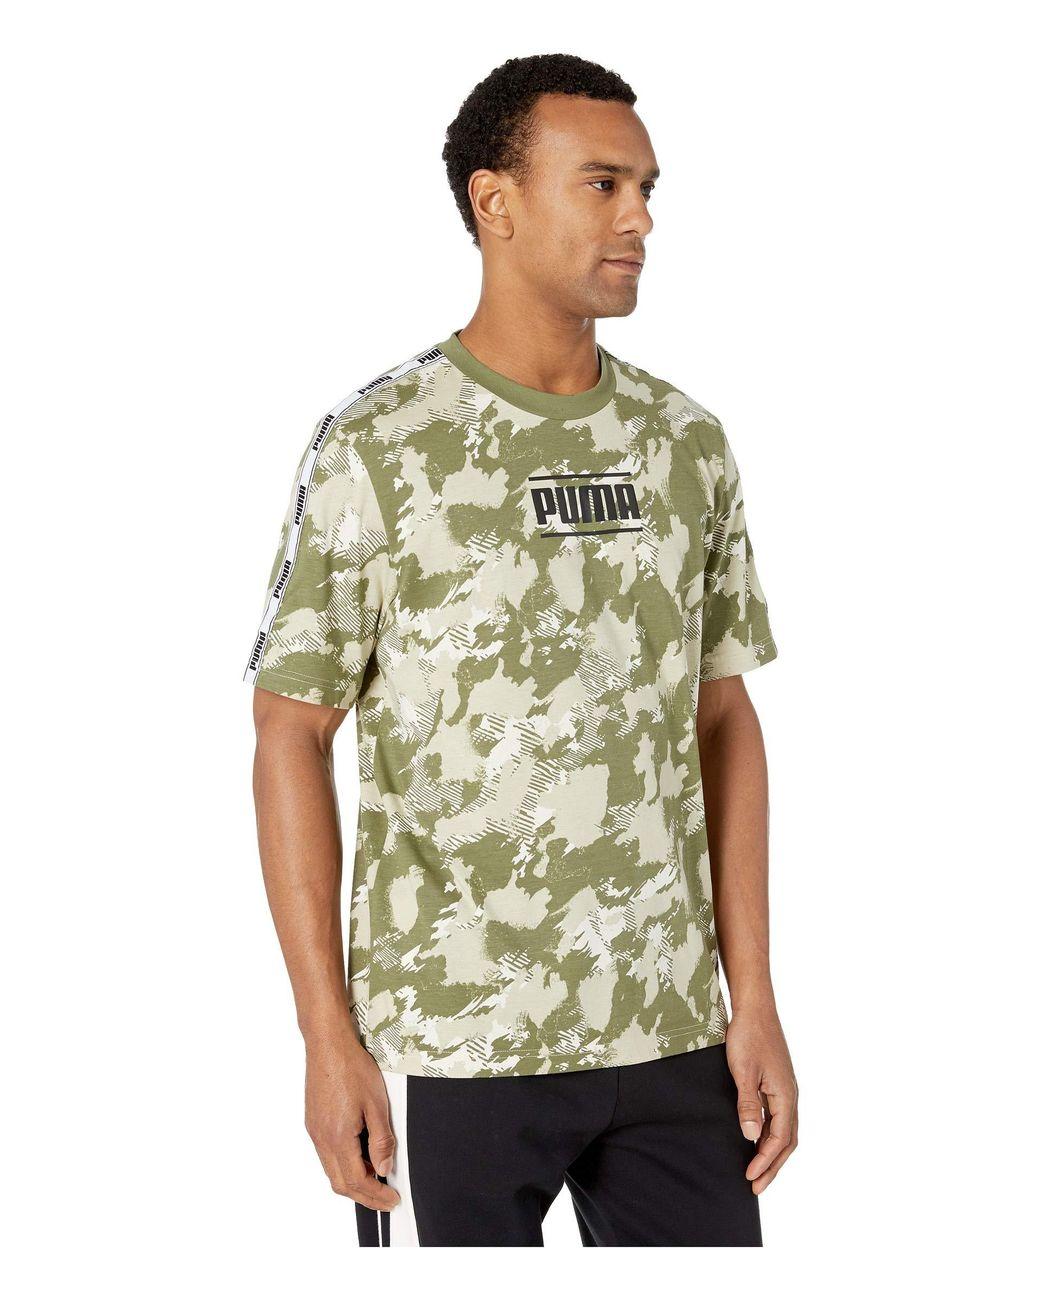 173d78a6423 Lyst - PUMA Camo Pack Aop Tee (indigo Bunting Aop) Men s T Shirt in Green  for Men - Save 3%